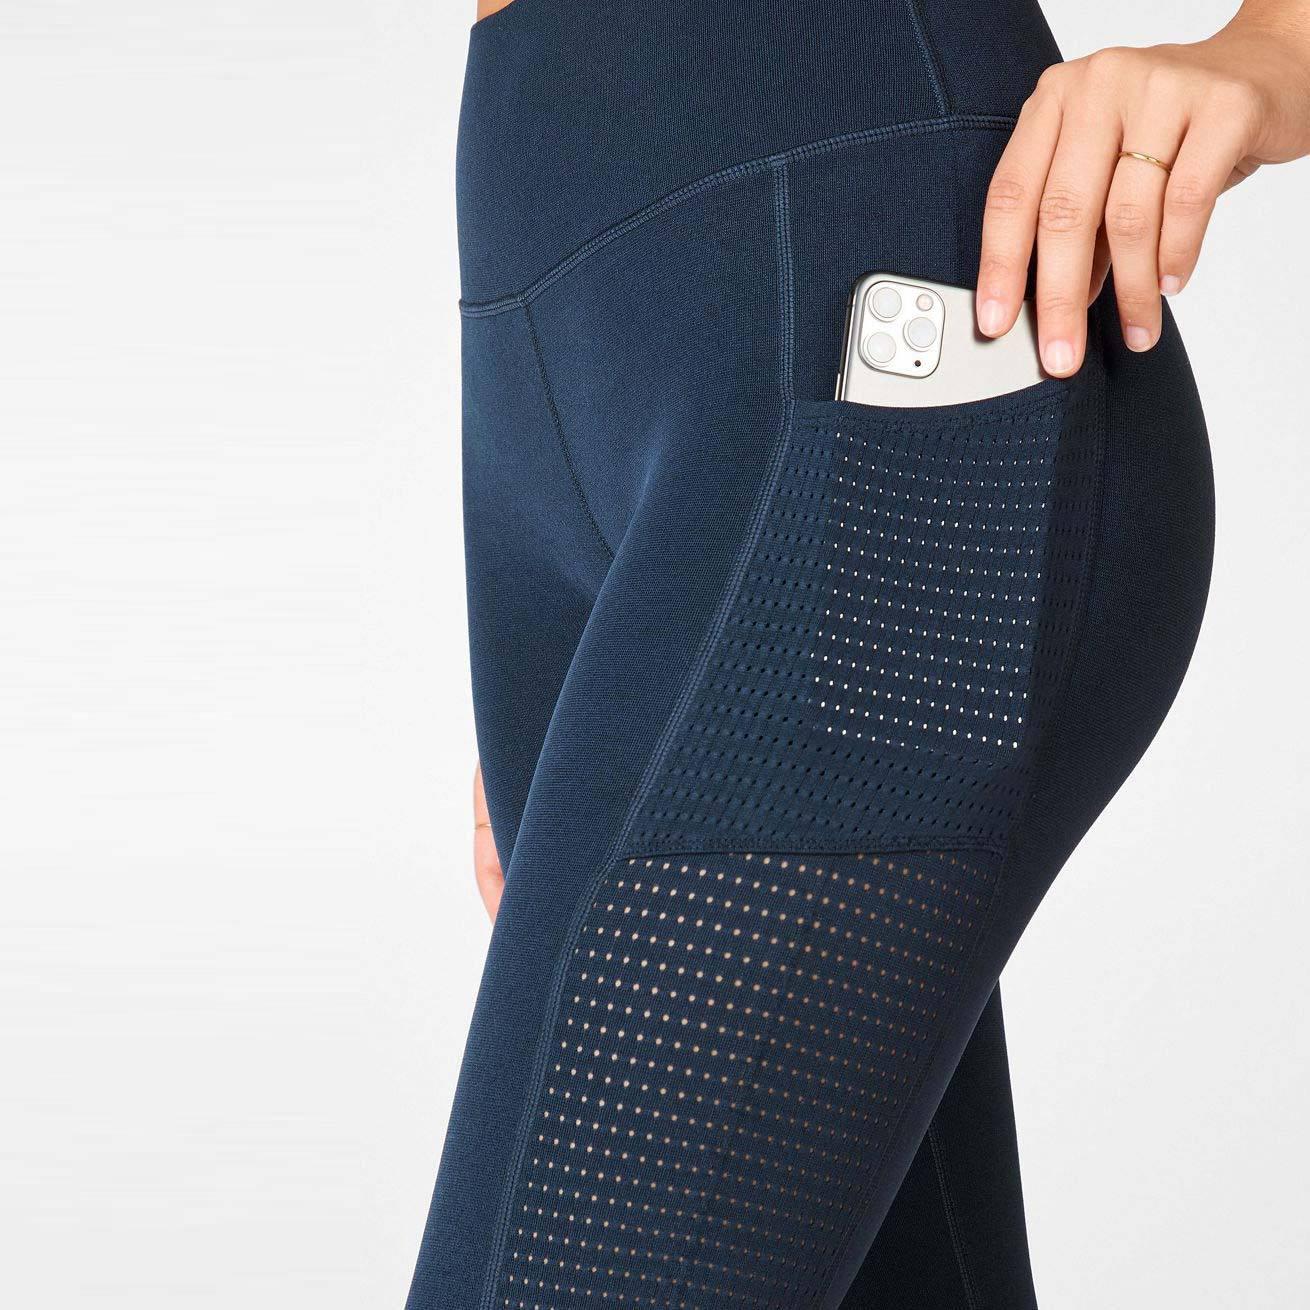 running leggings with pockets